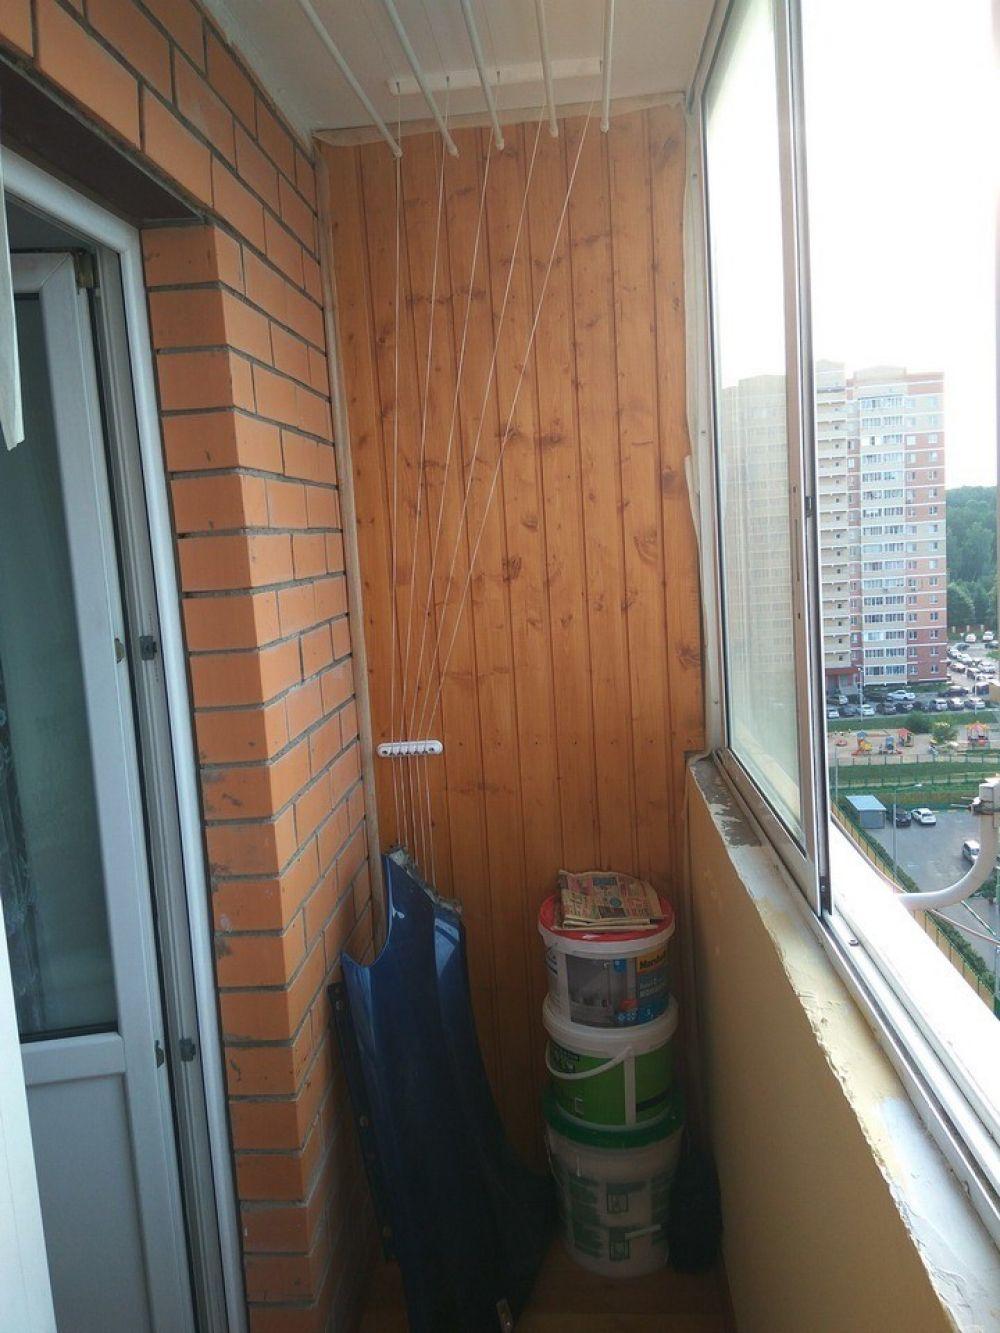 1-комнатная квартира 47.6 м2, г. Щелково, Богородский мкр,10, фото 13